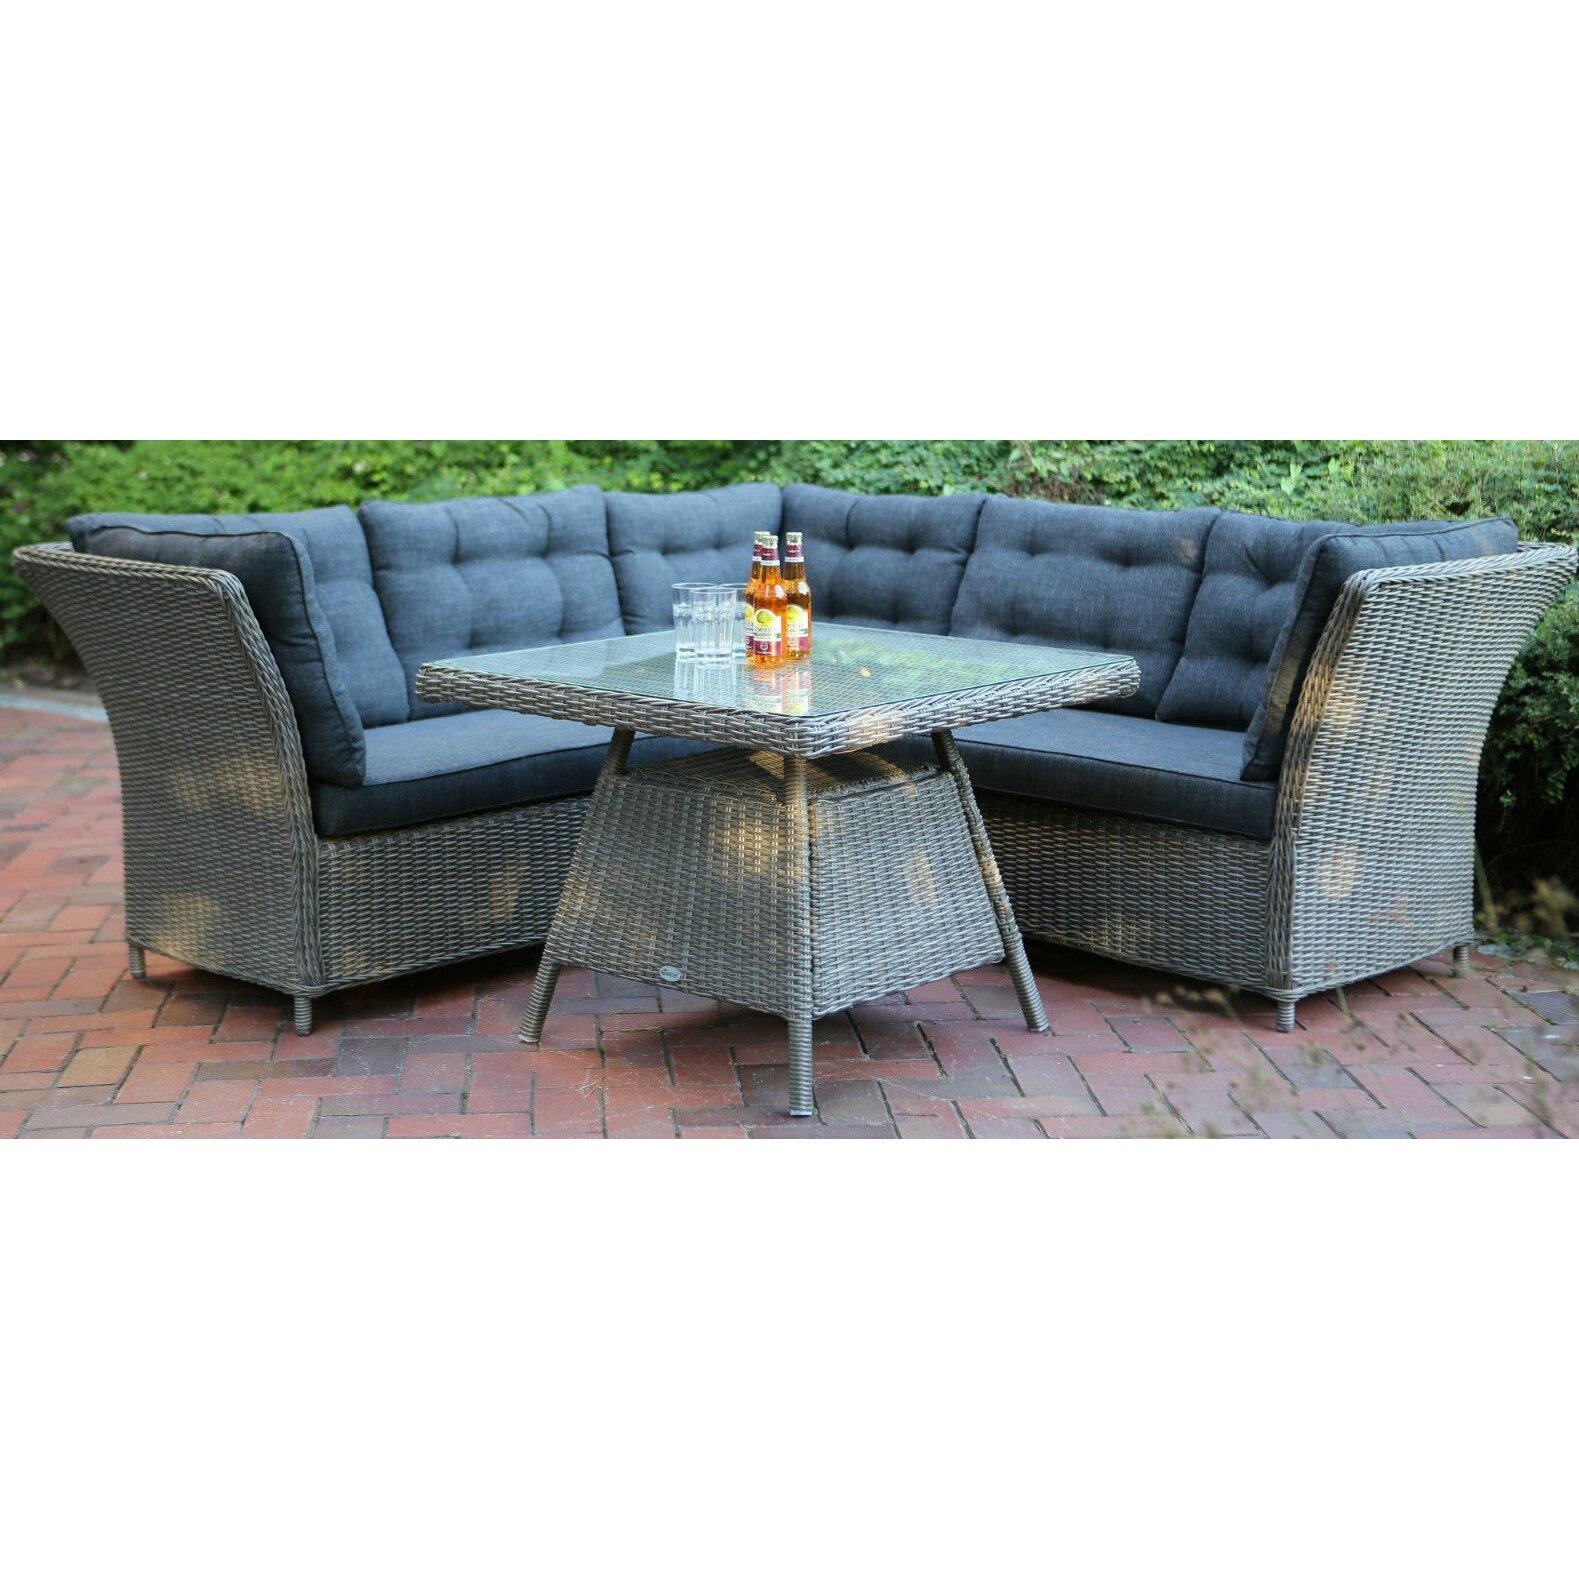 destiny 4 tlg sofa set palma mit kissen bewertungen. Black Bedroom Furniture Sets. Home Design Ideas